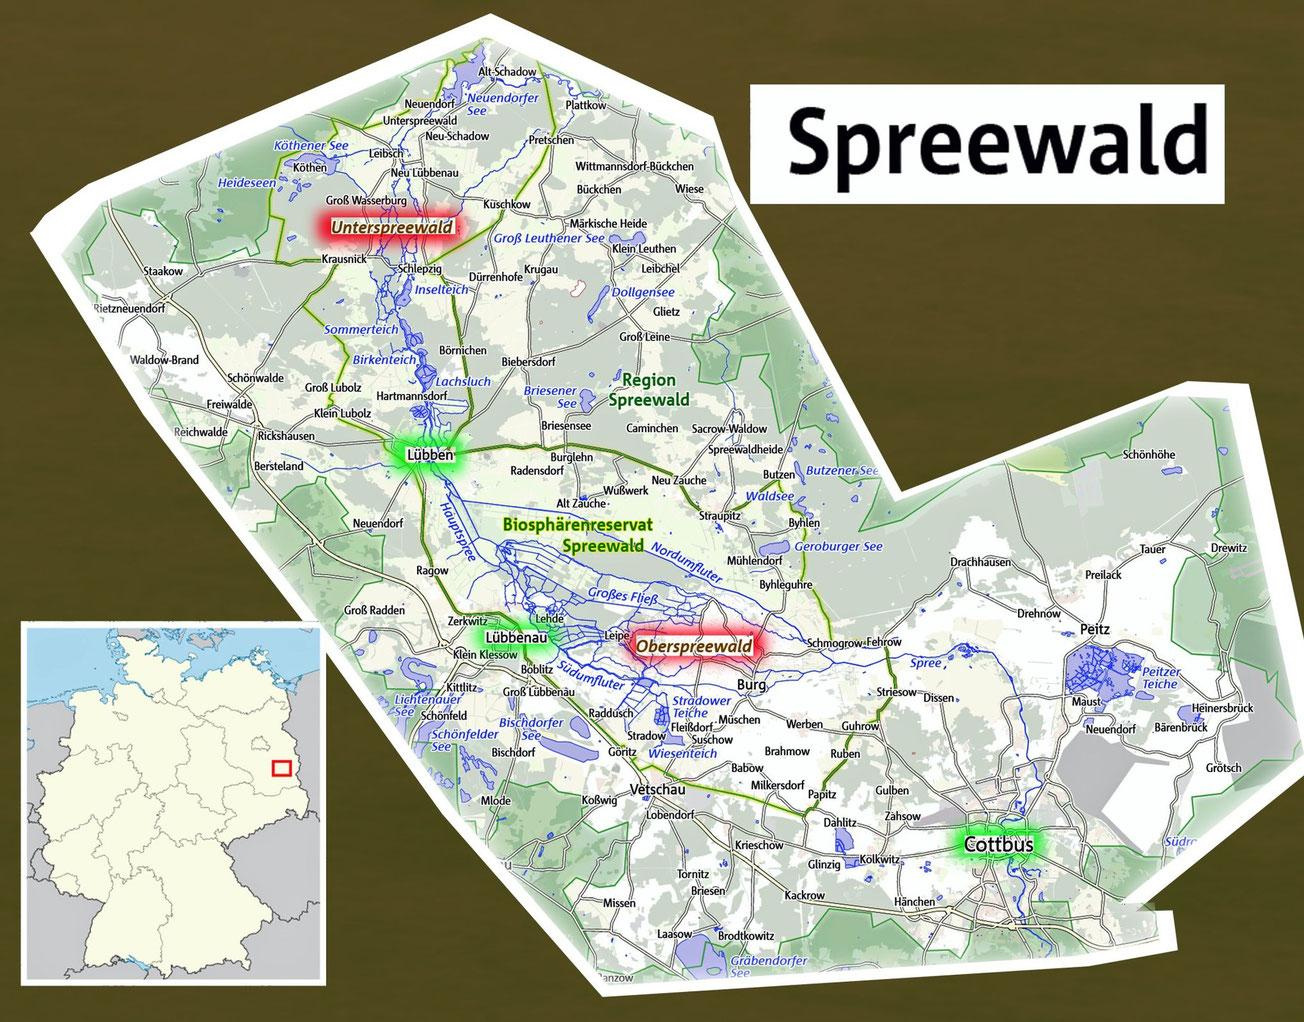 Unterspreewald Richtung Berlin, Oberspreewald Richtung Cottbus